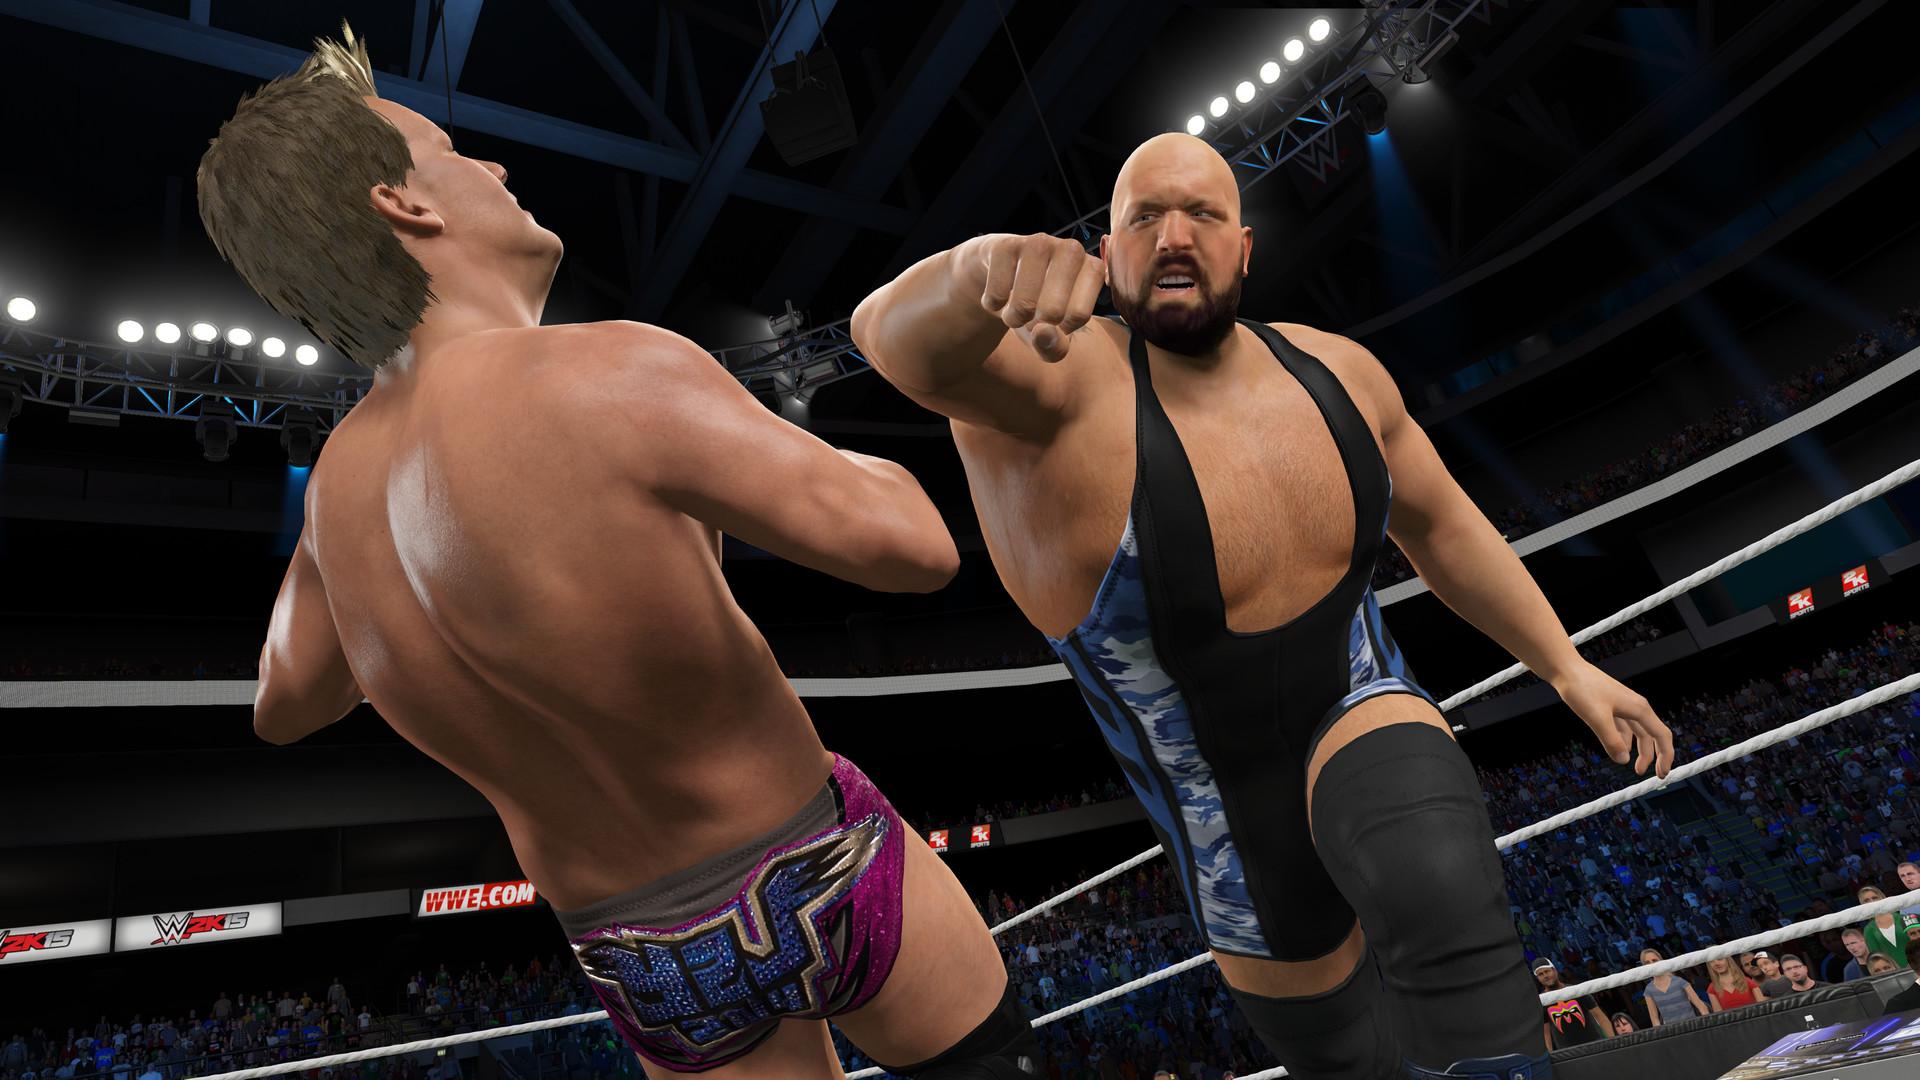 WWE 2K15 ESPAÑOL Full PC + DLC Pack Addon (RELOADED) + REPACK 5 DVD5 (JPW) 3